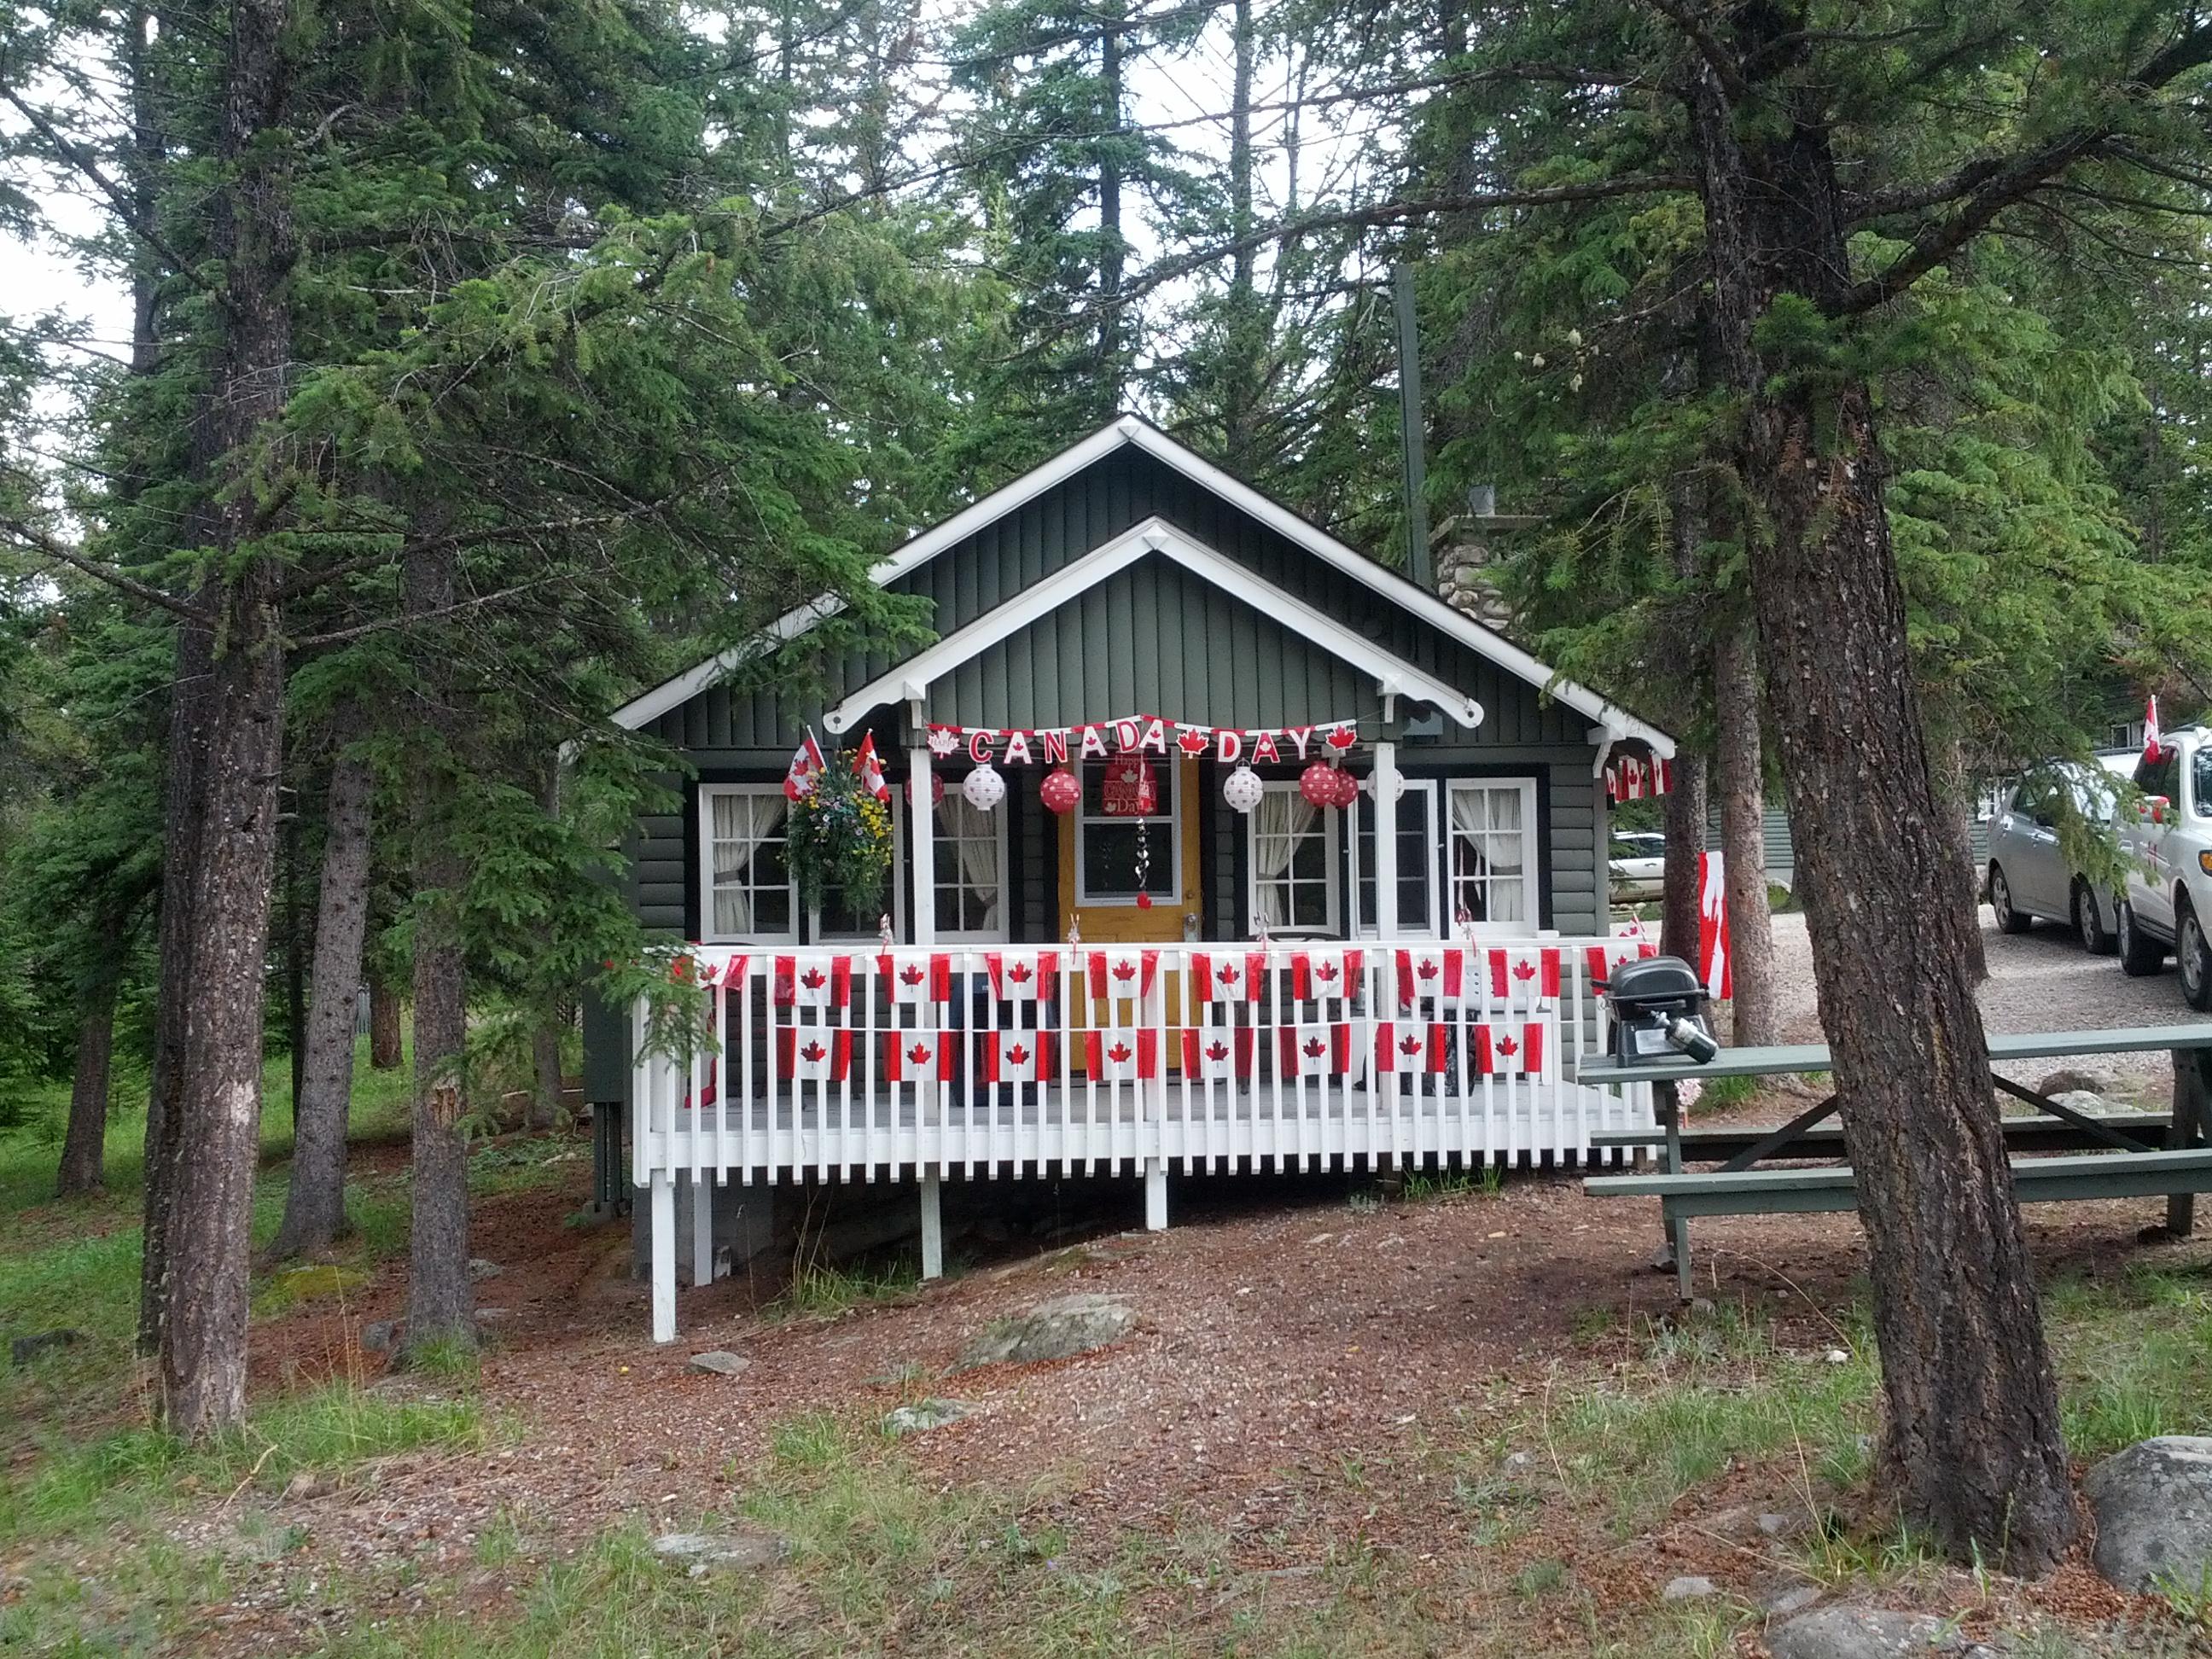 Decoration For Canada Day In Jasper Entdecker Blog